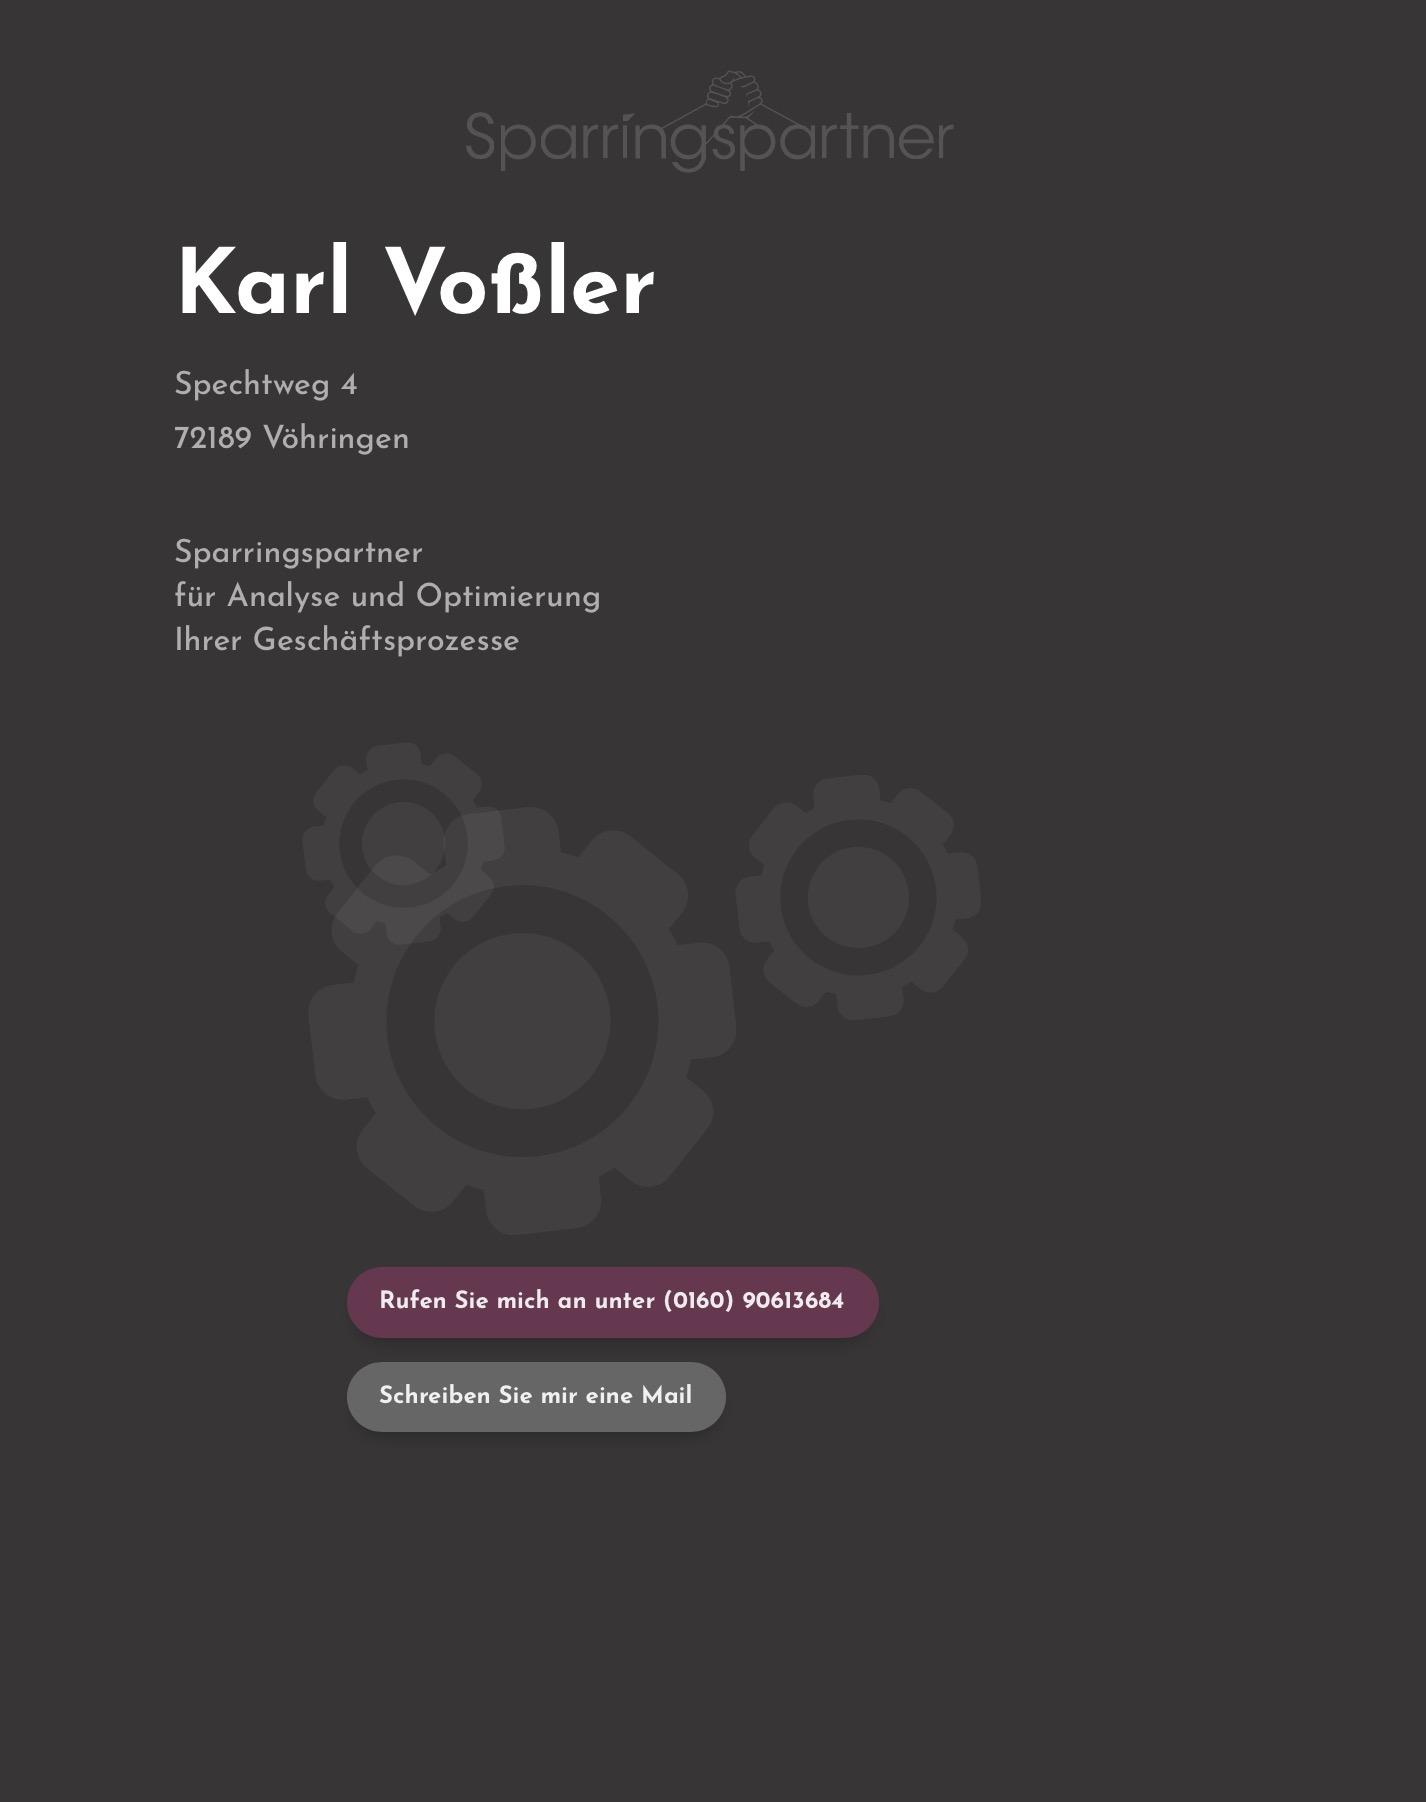 Karl-Vossler-Sparringspartner